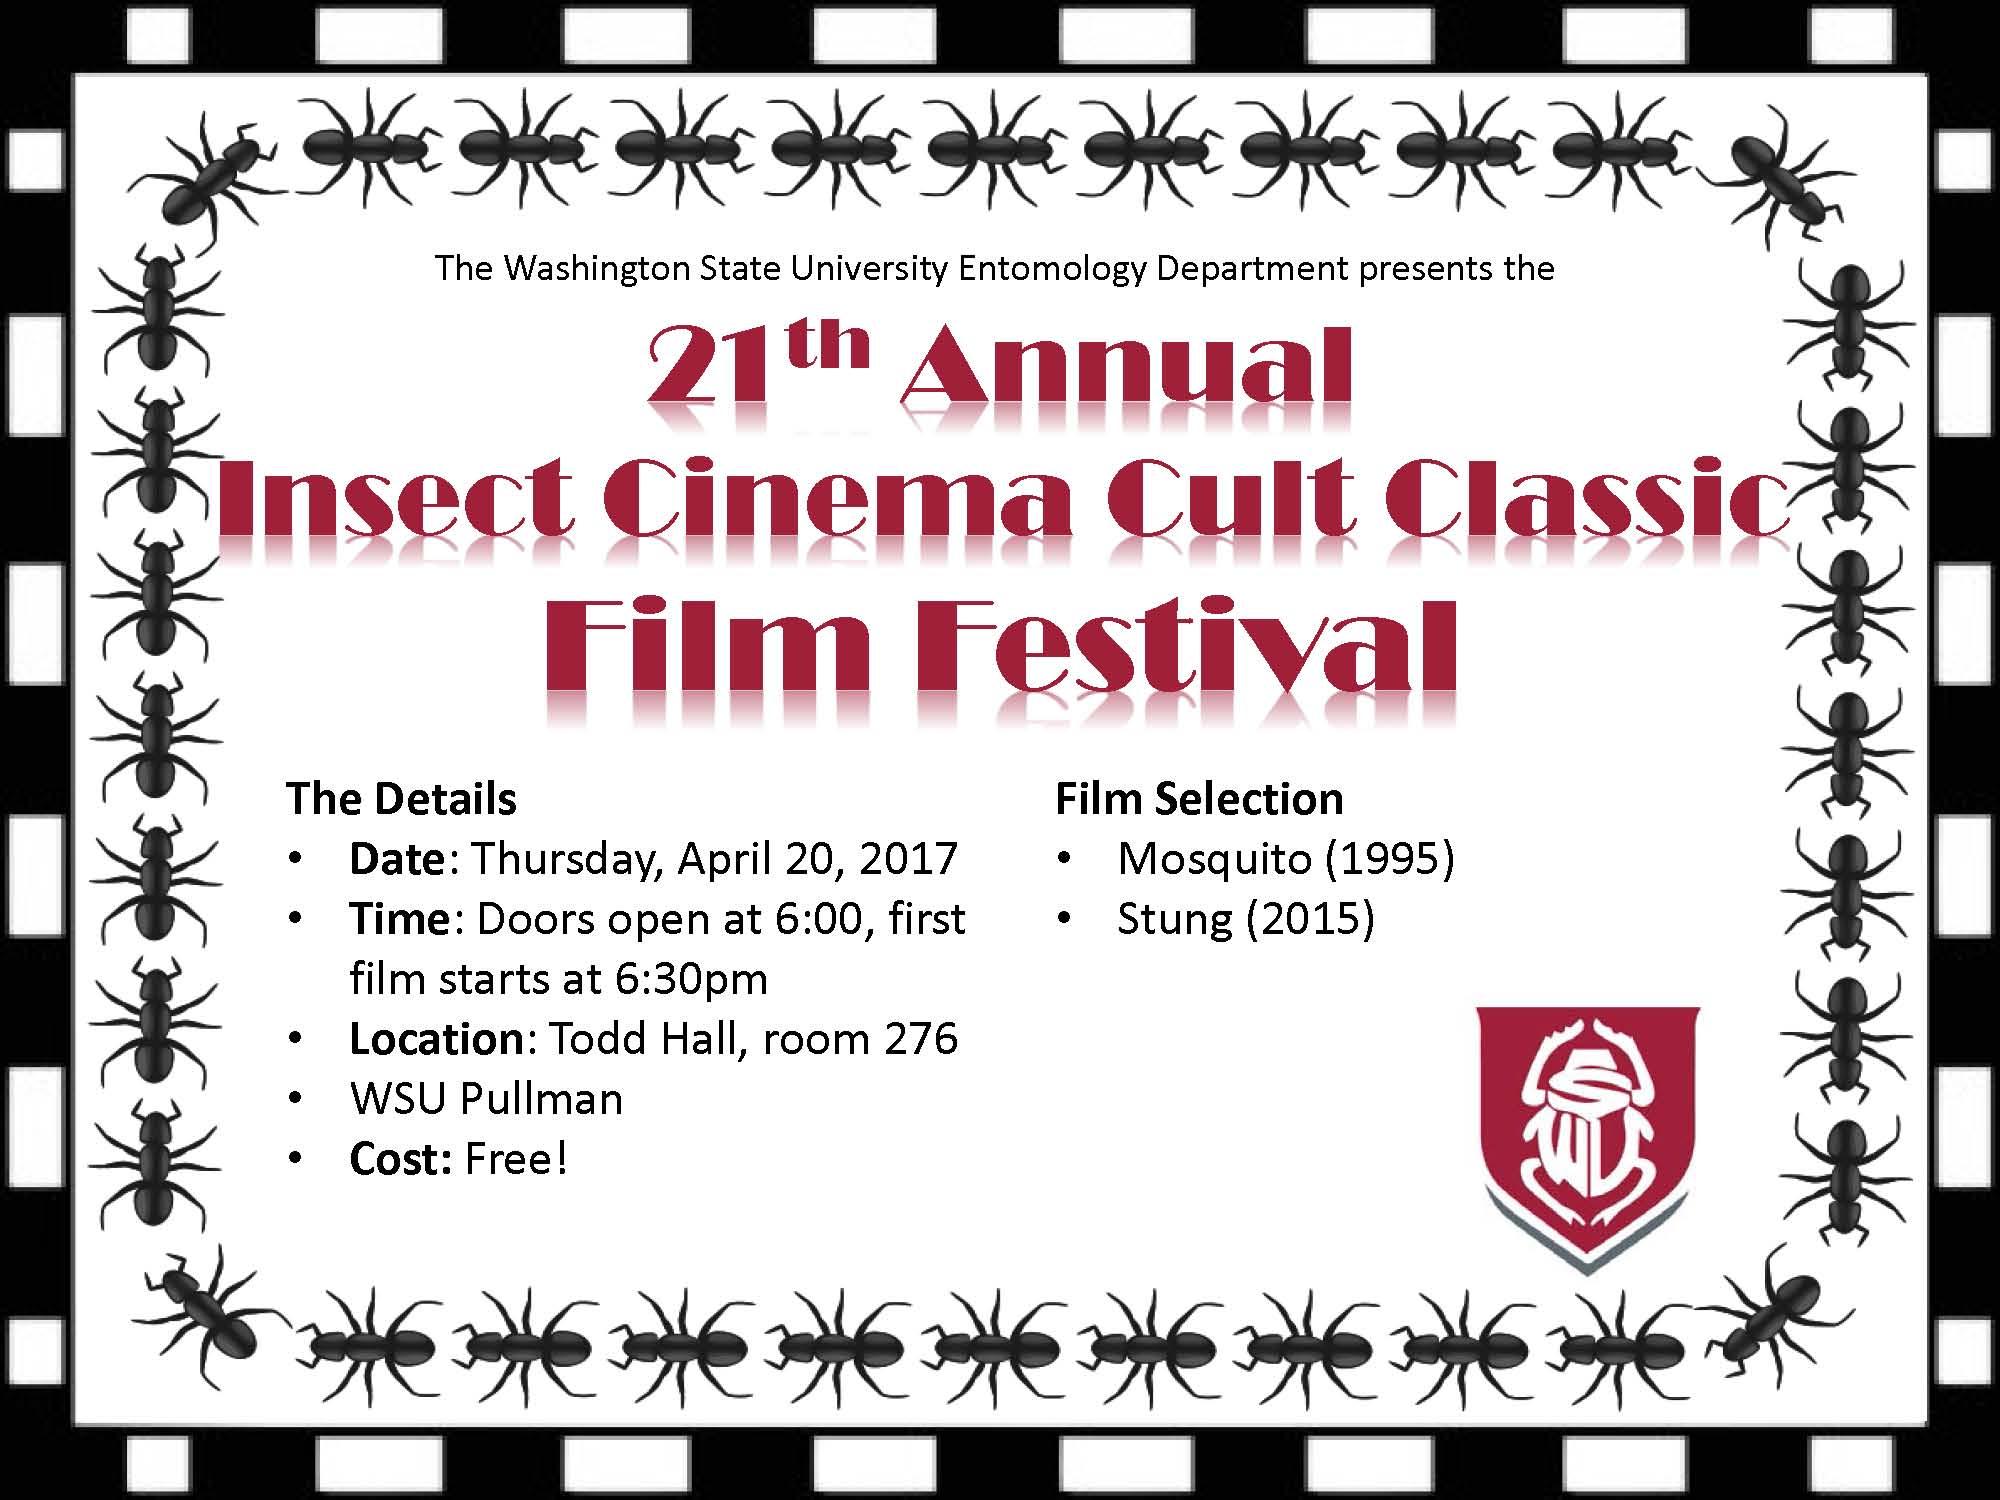 Annual Cult Classic Cinema